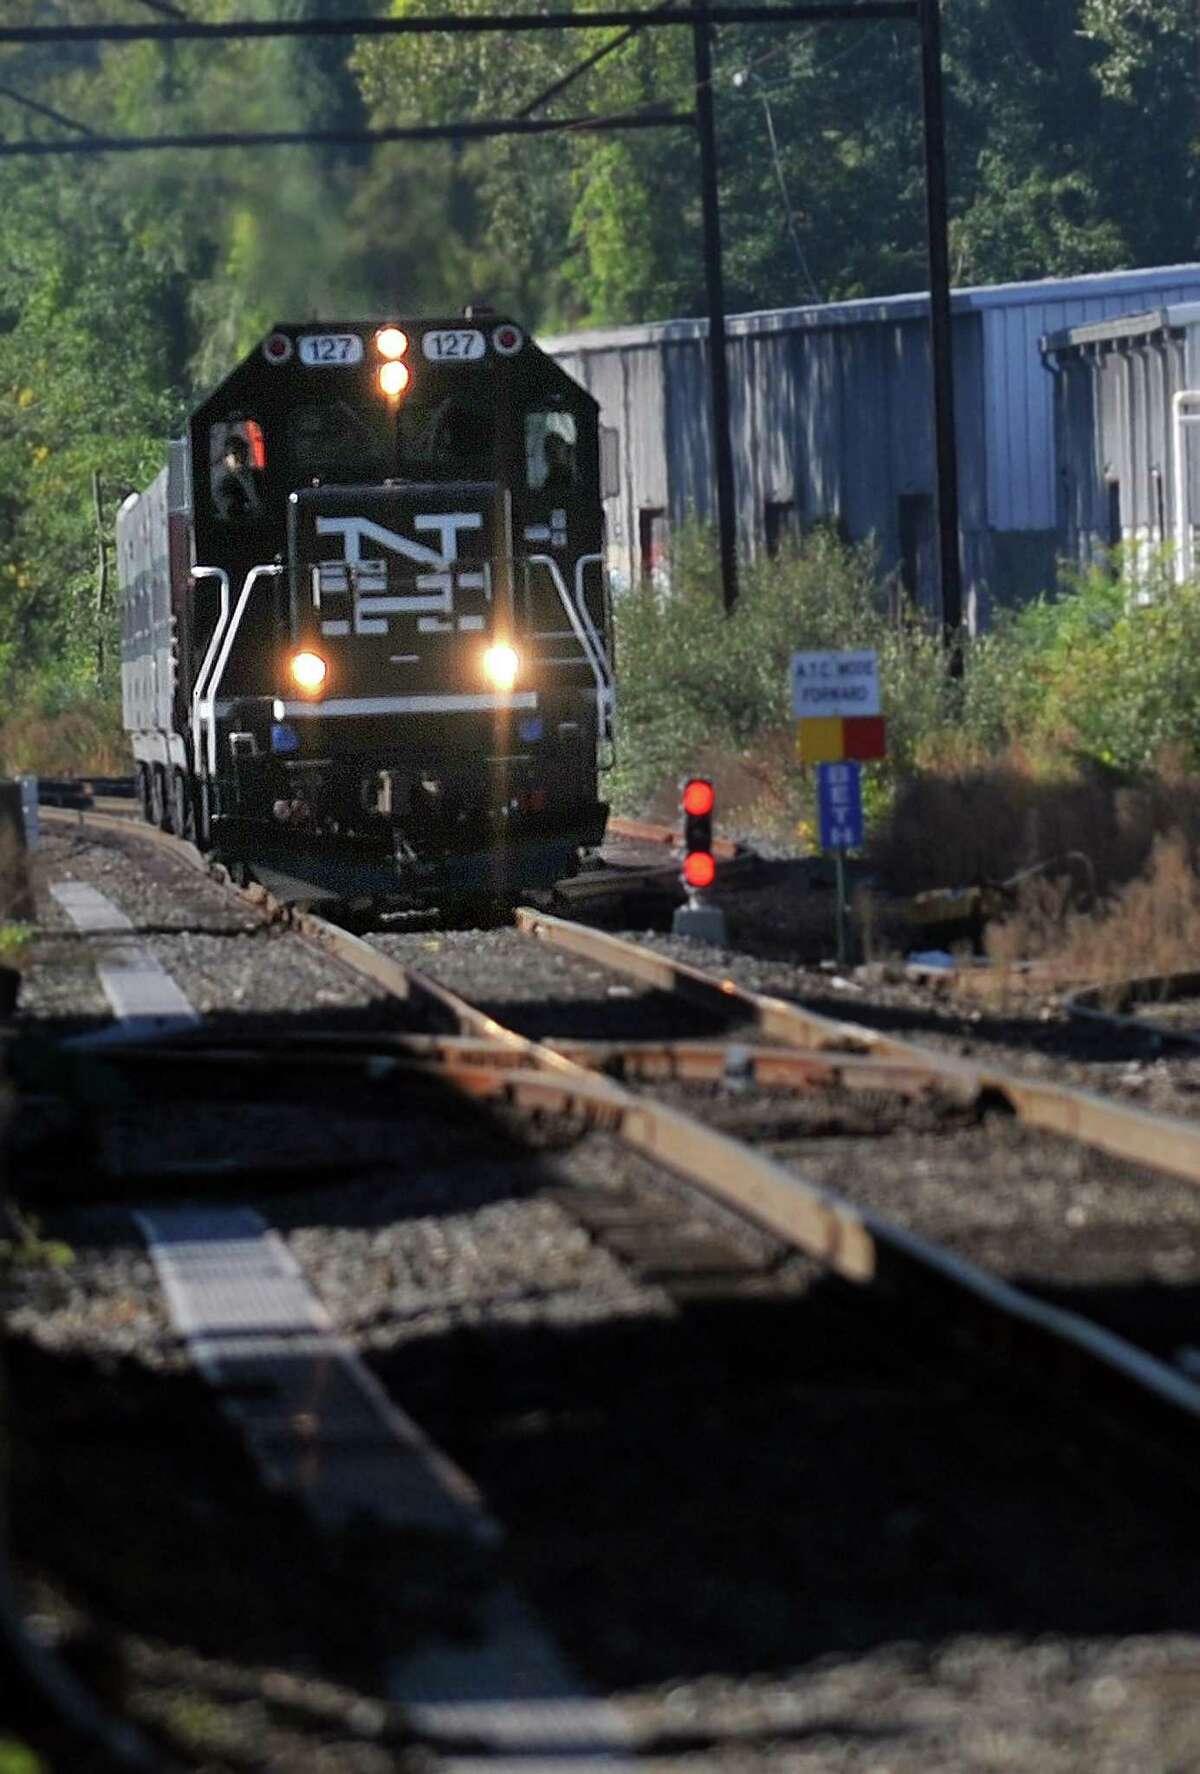 A Metro North train nears the Bethel, Conn. train station, Sept. 20, 2013.